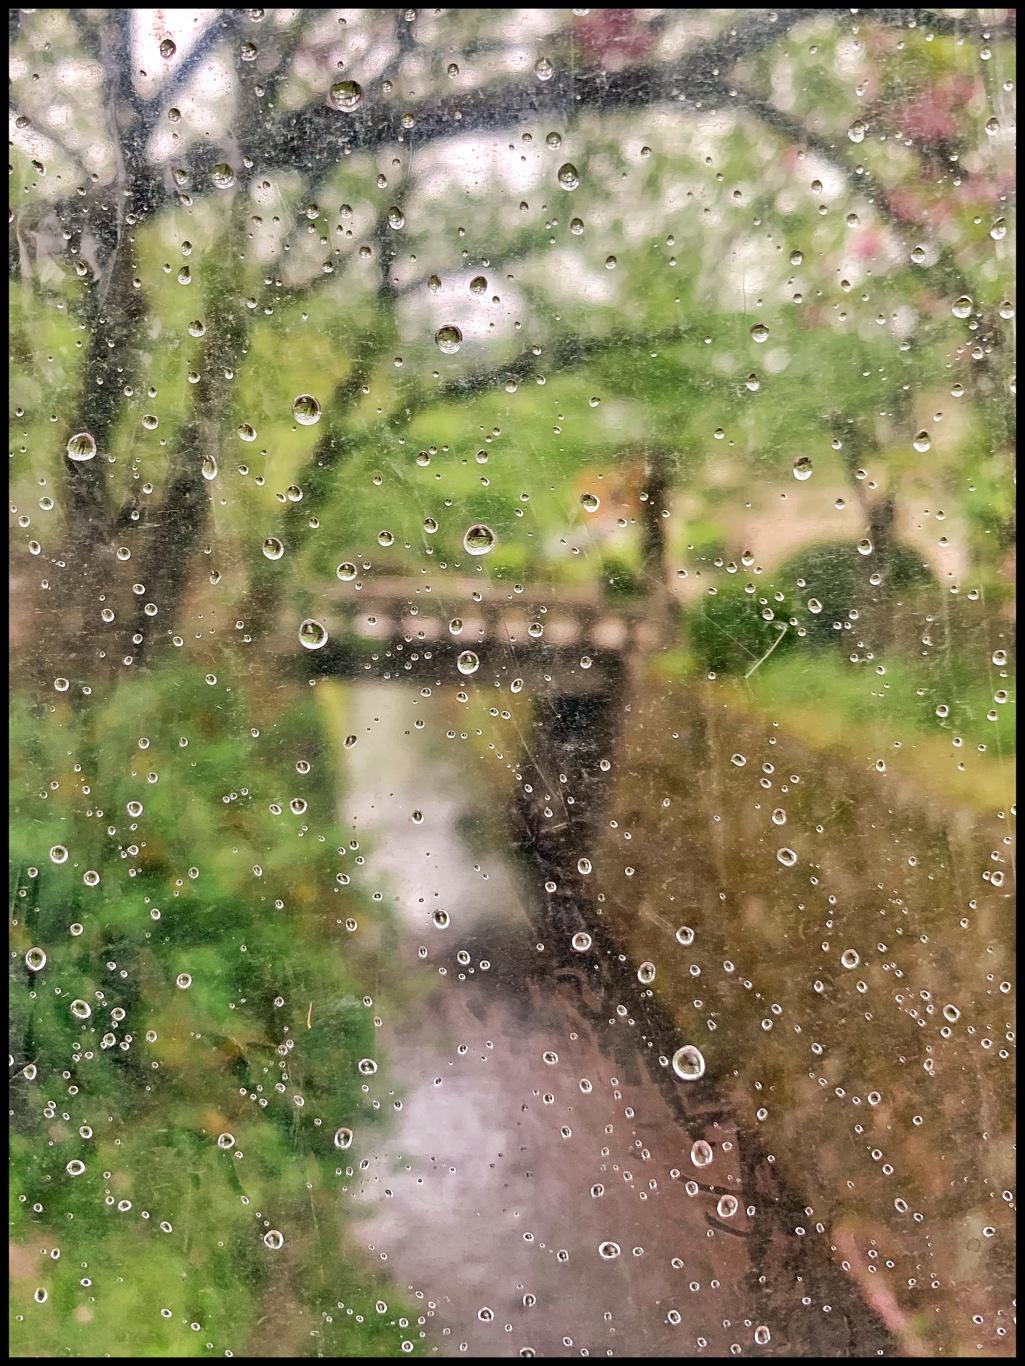 The Philosopher's Path, as seen through an accidental umbrella